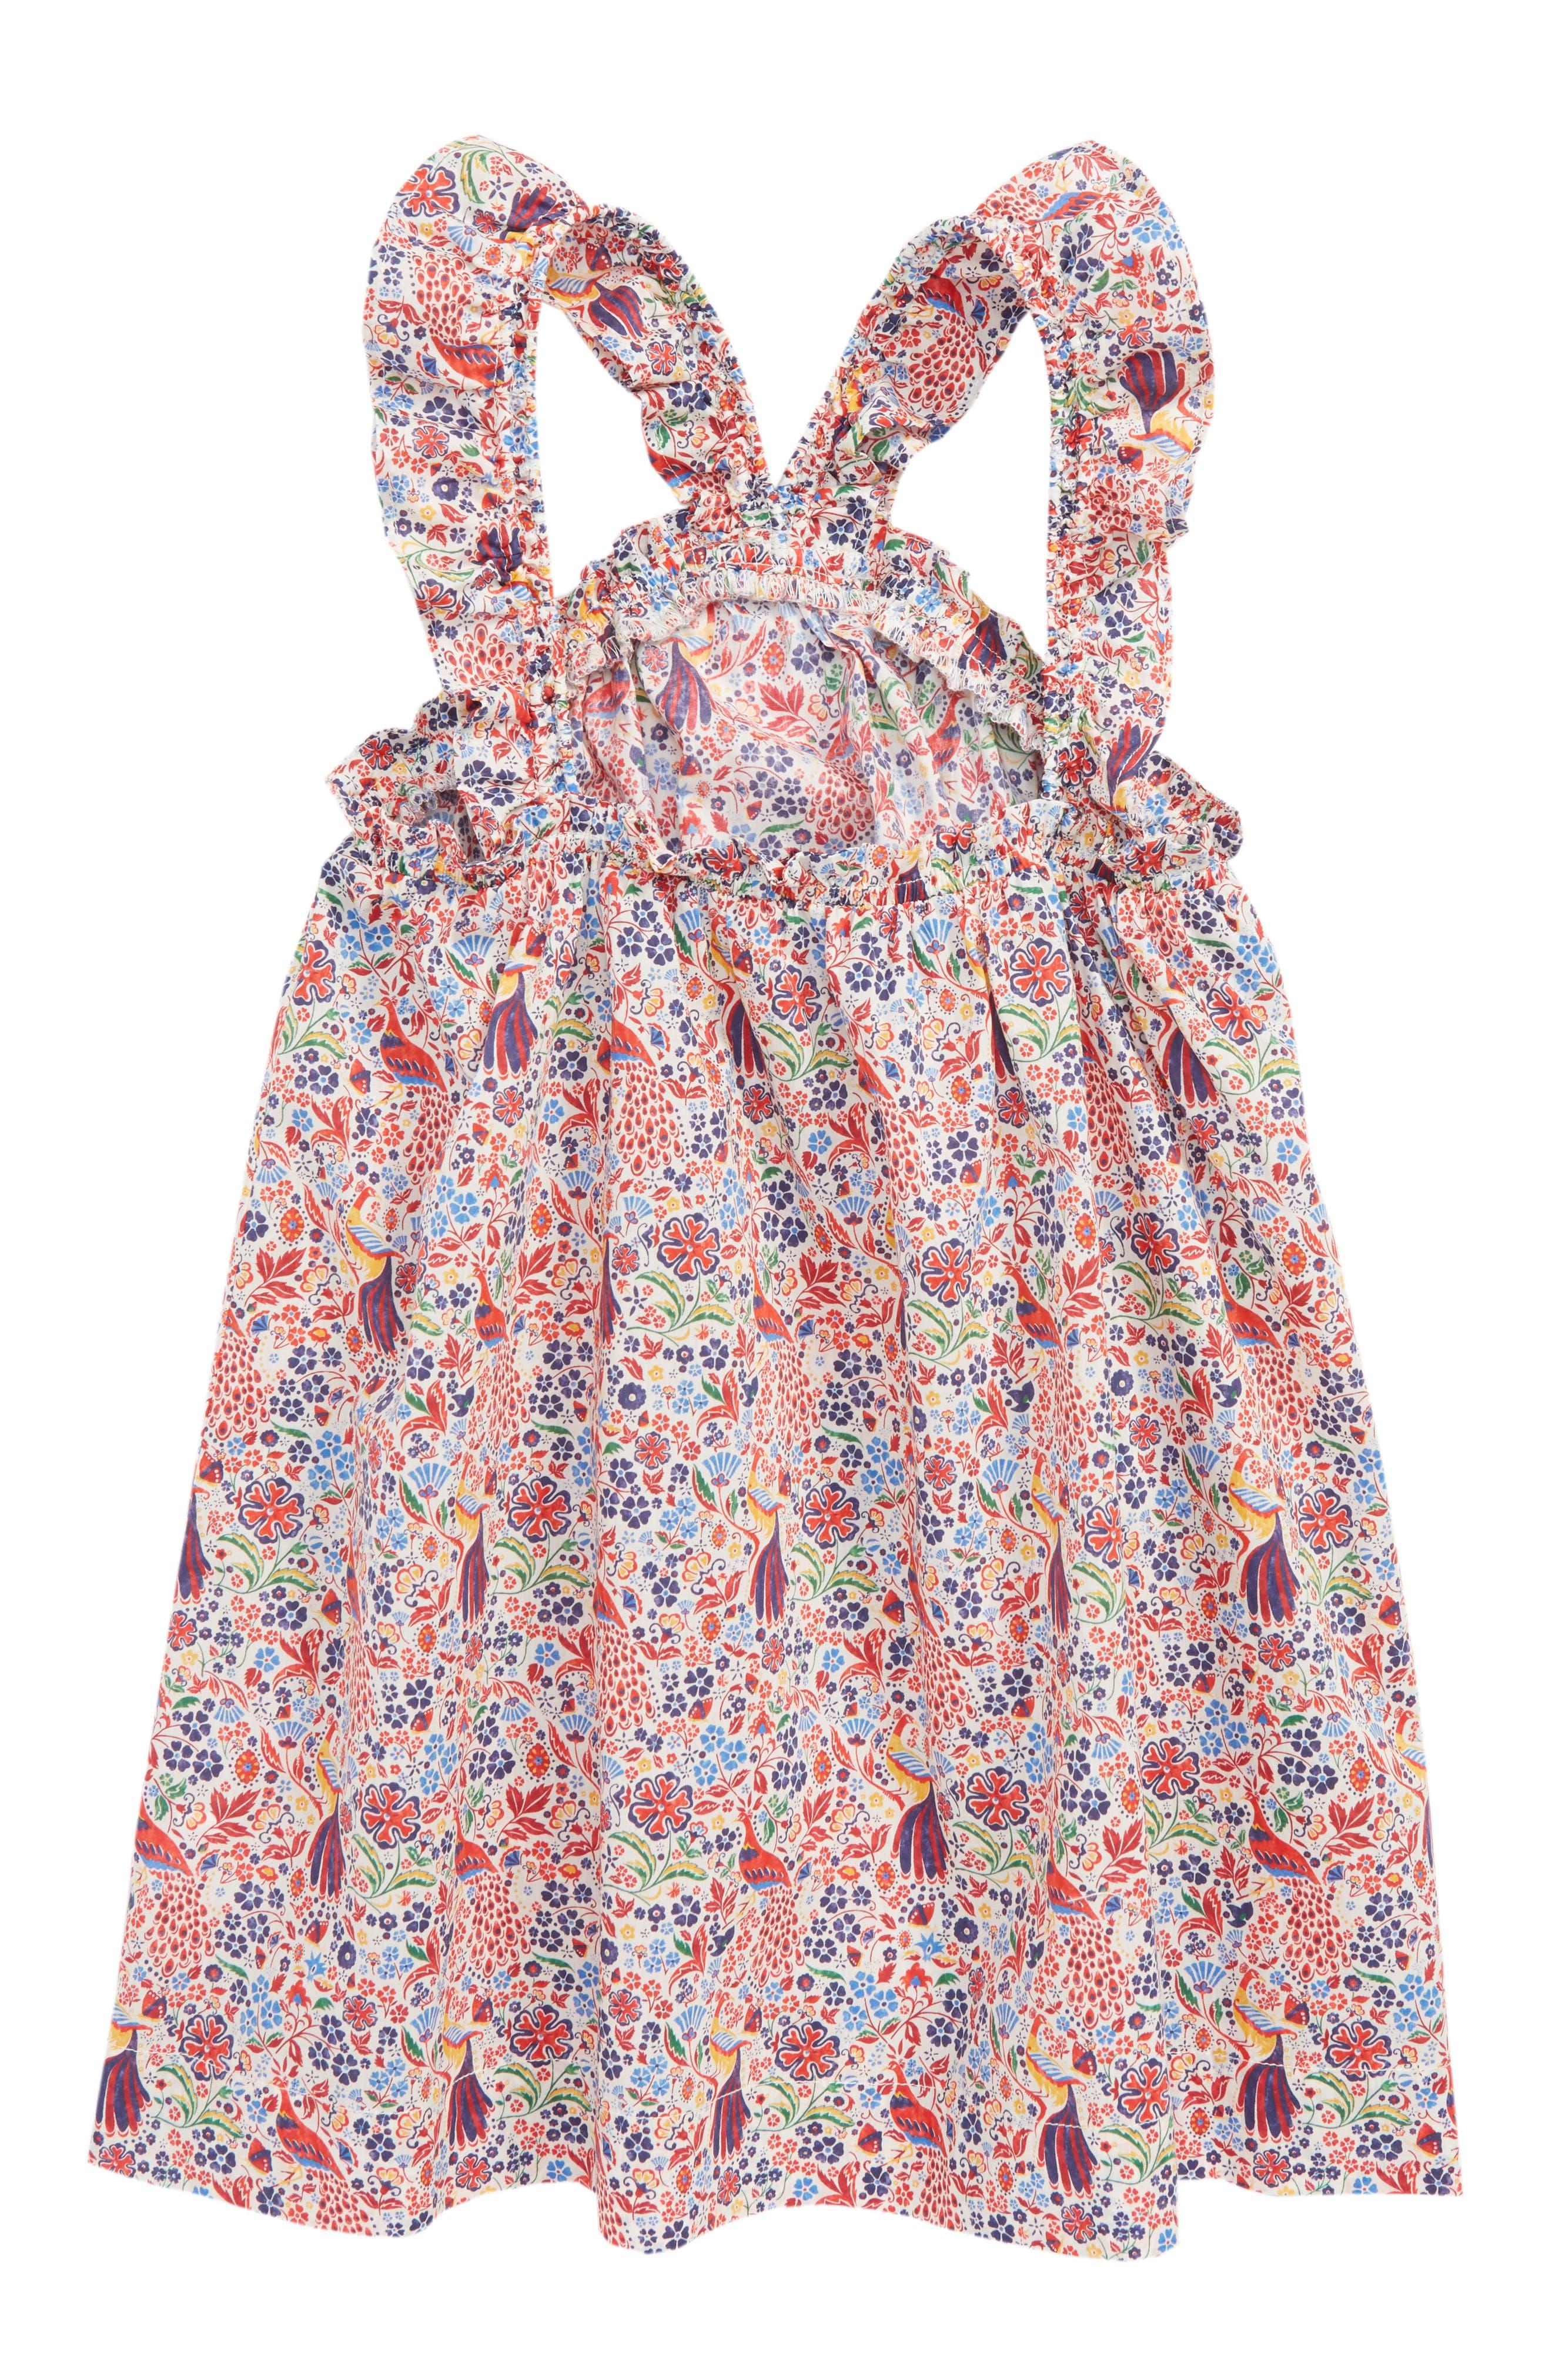 Liberty<sup>®</sup> Print Dress,                             Alternate thumbnail 2, color,                             650